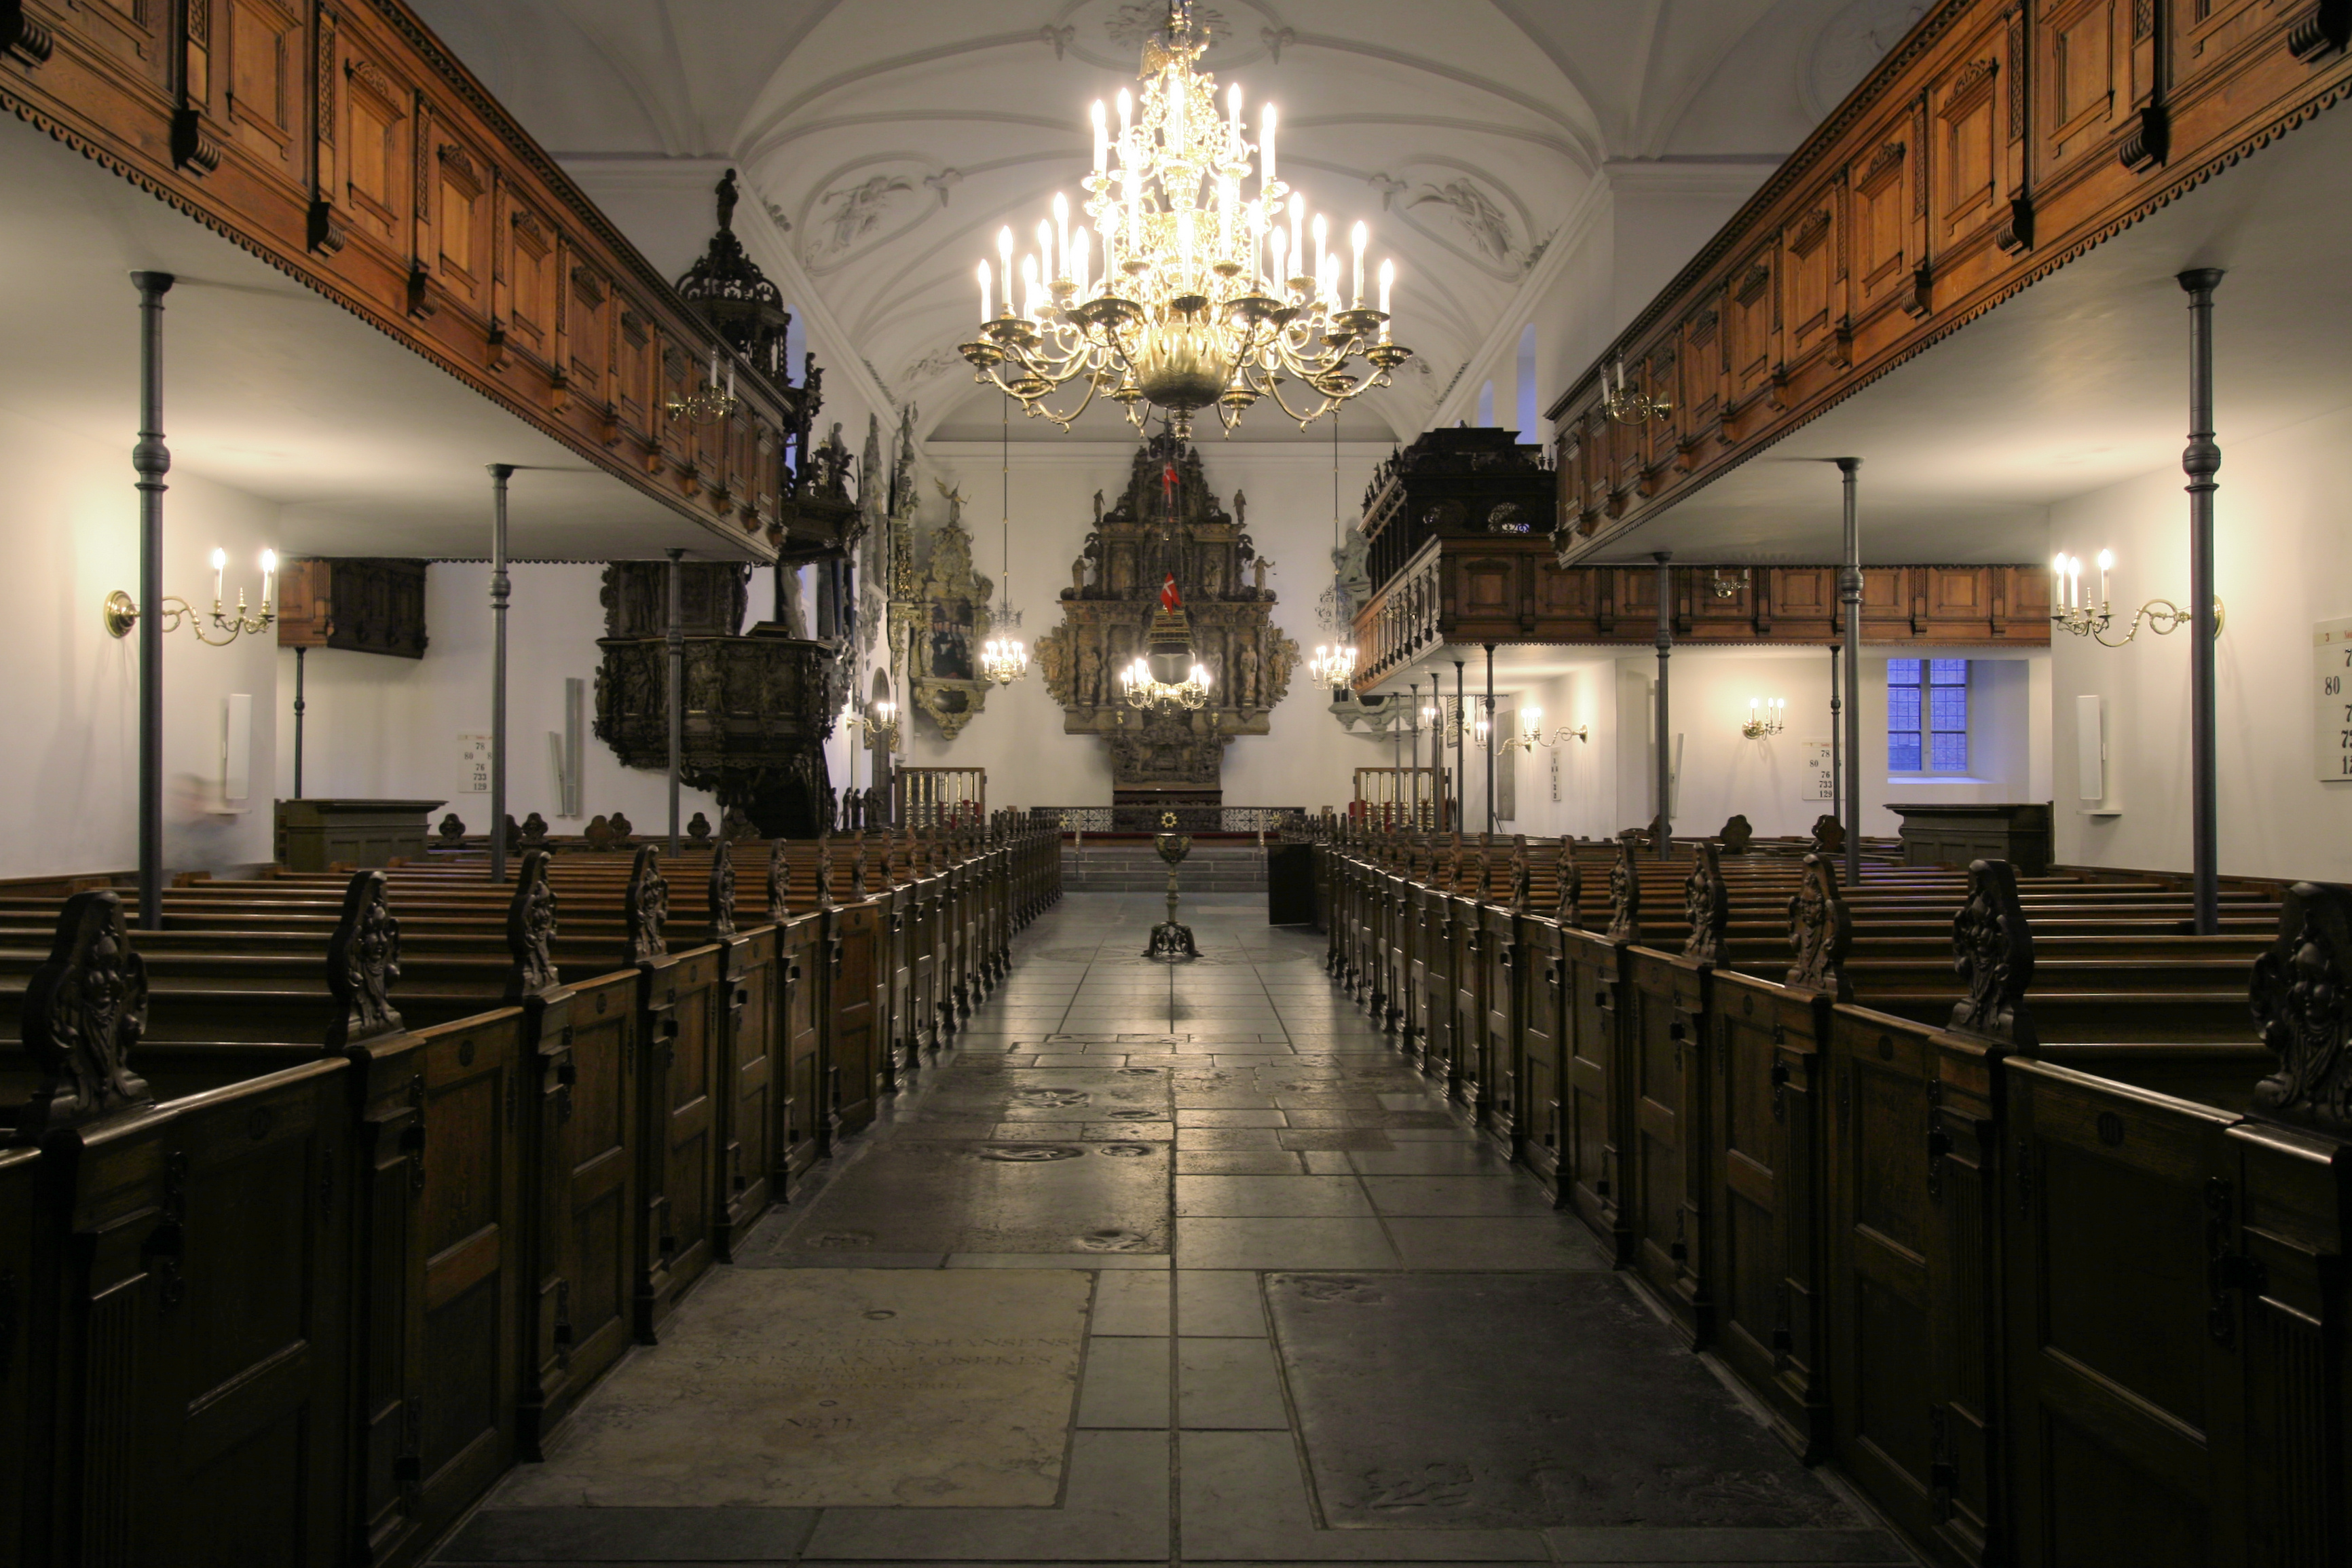 File:Holmens Kirke Copenhagen interior2.jpg - Wikimedia Commons